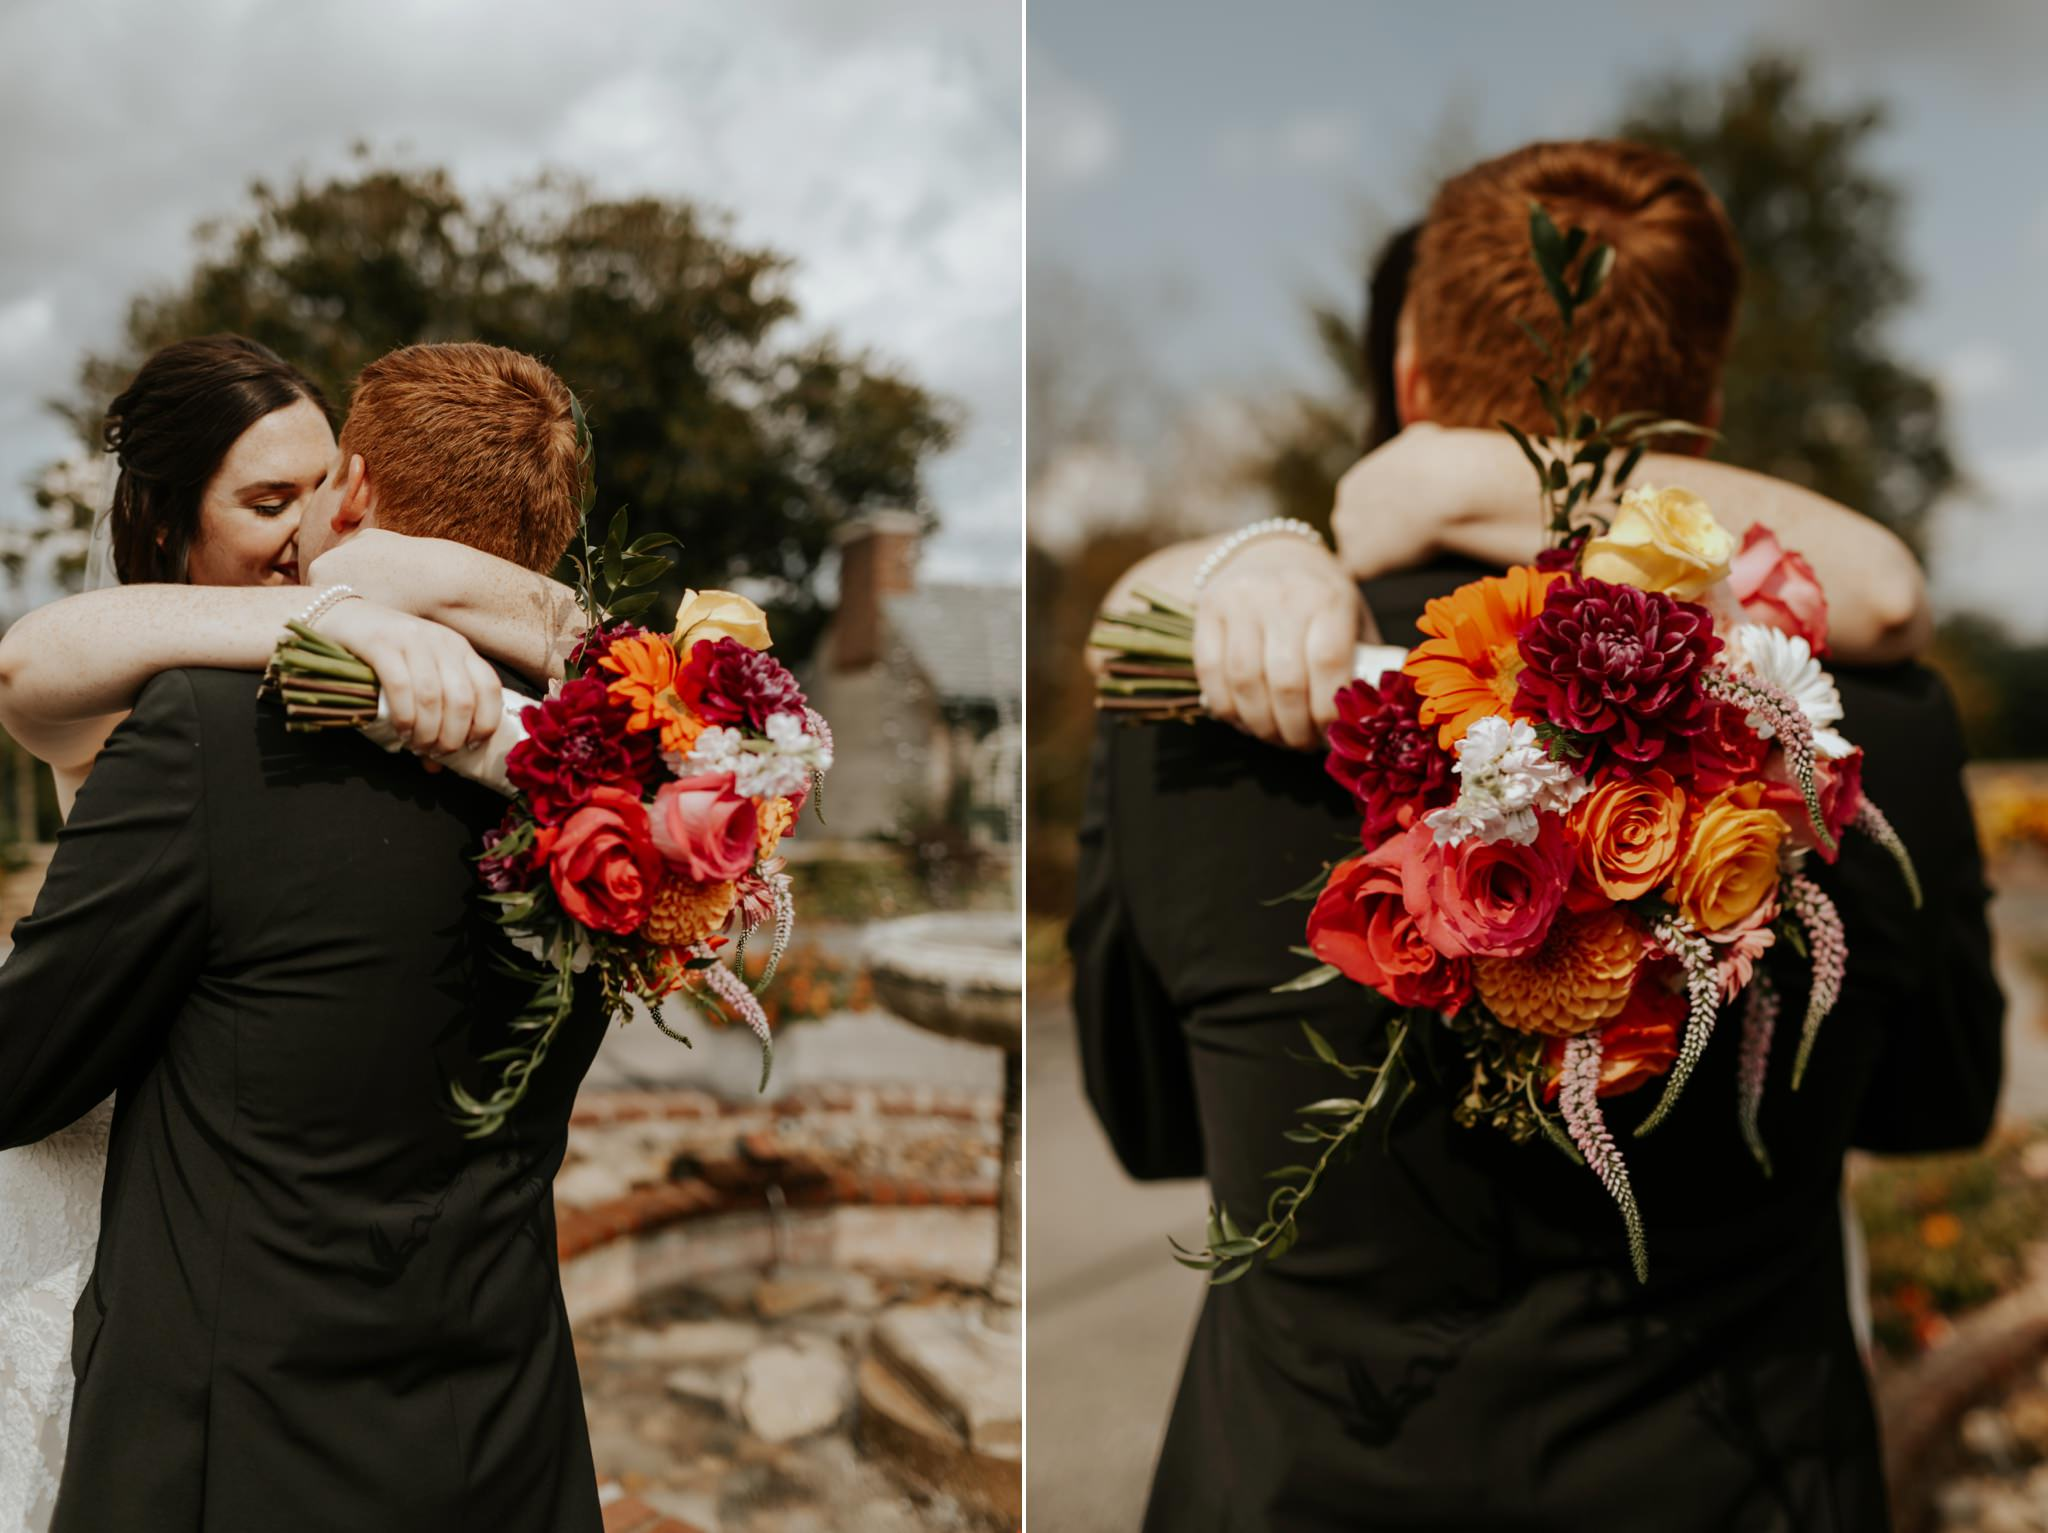 17-09-15 Lindsey and Brandon Wedding Edited-343_WEB.jpg